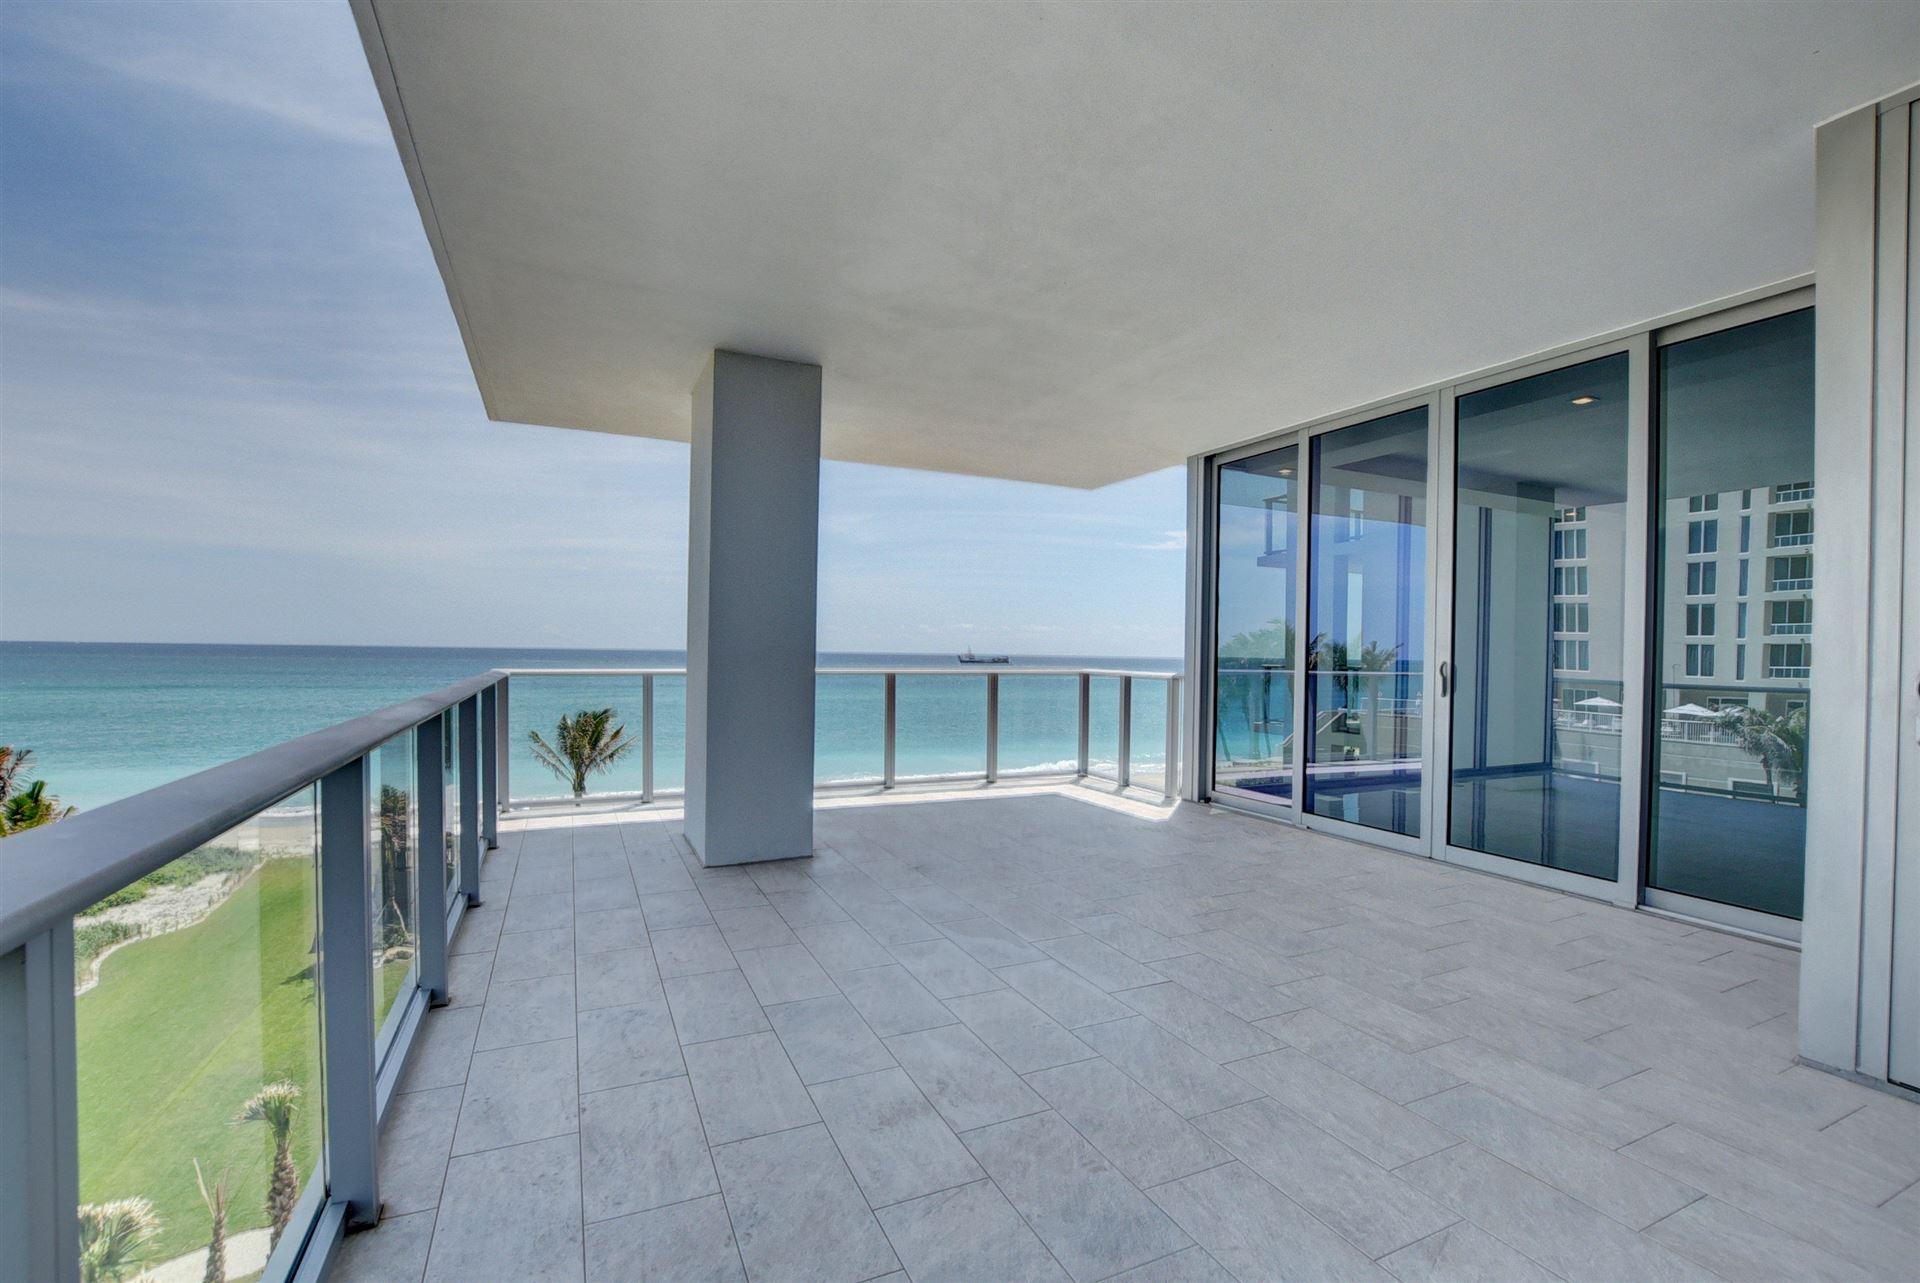 Photo of 5000 N Ocean Drive #501, Riviera Beach, FL 33404 (MLS # RX-10644676)